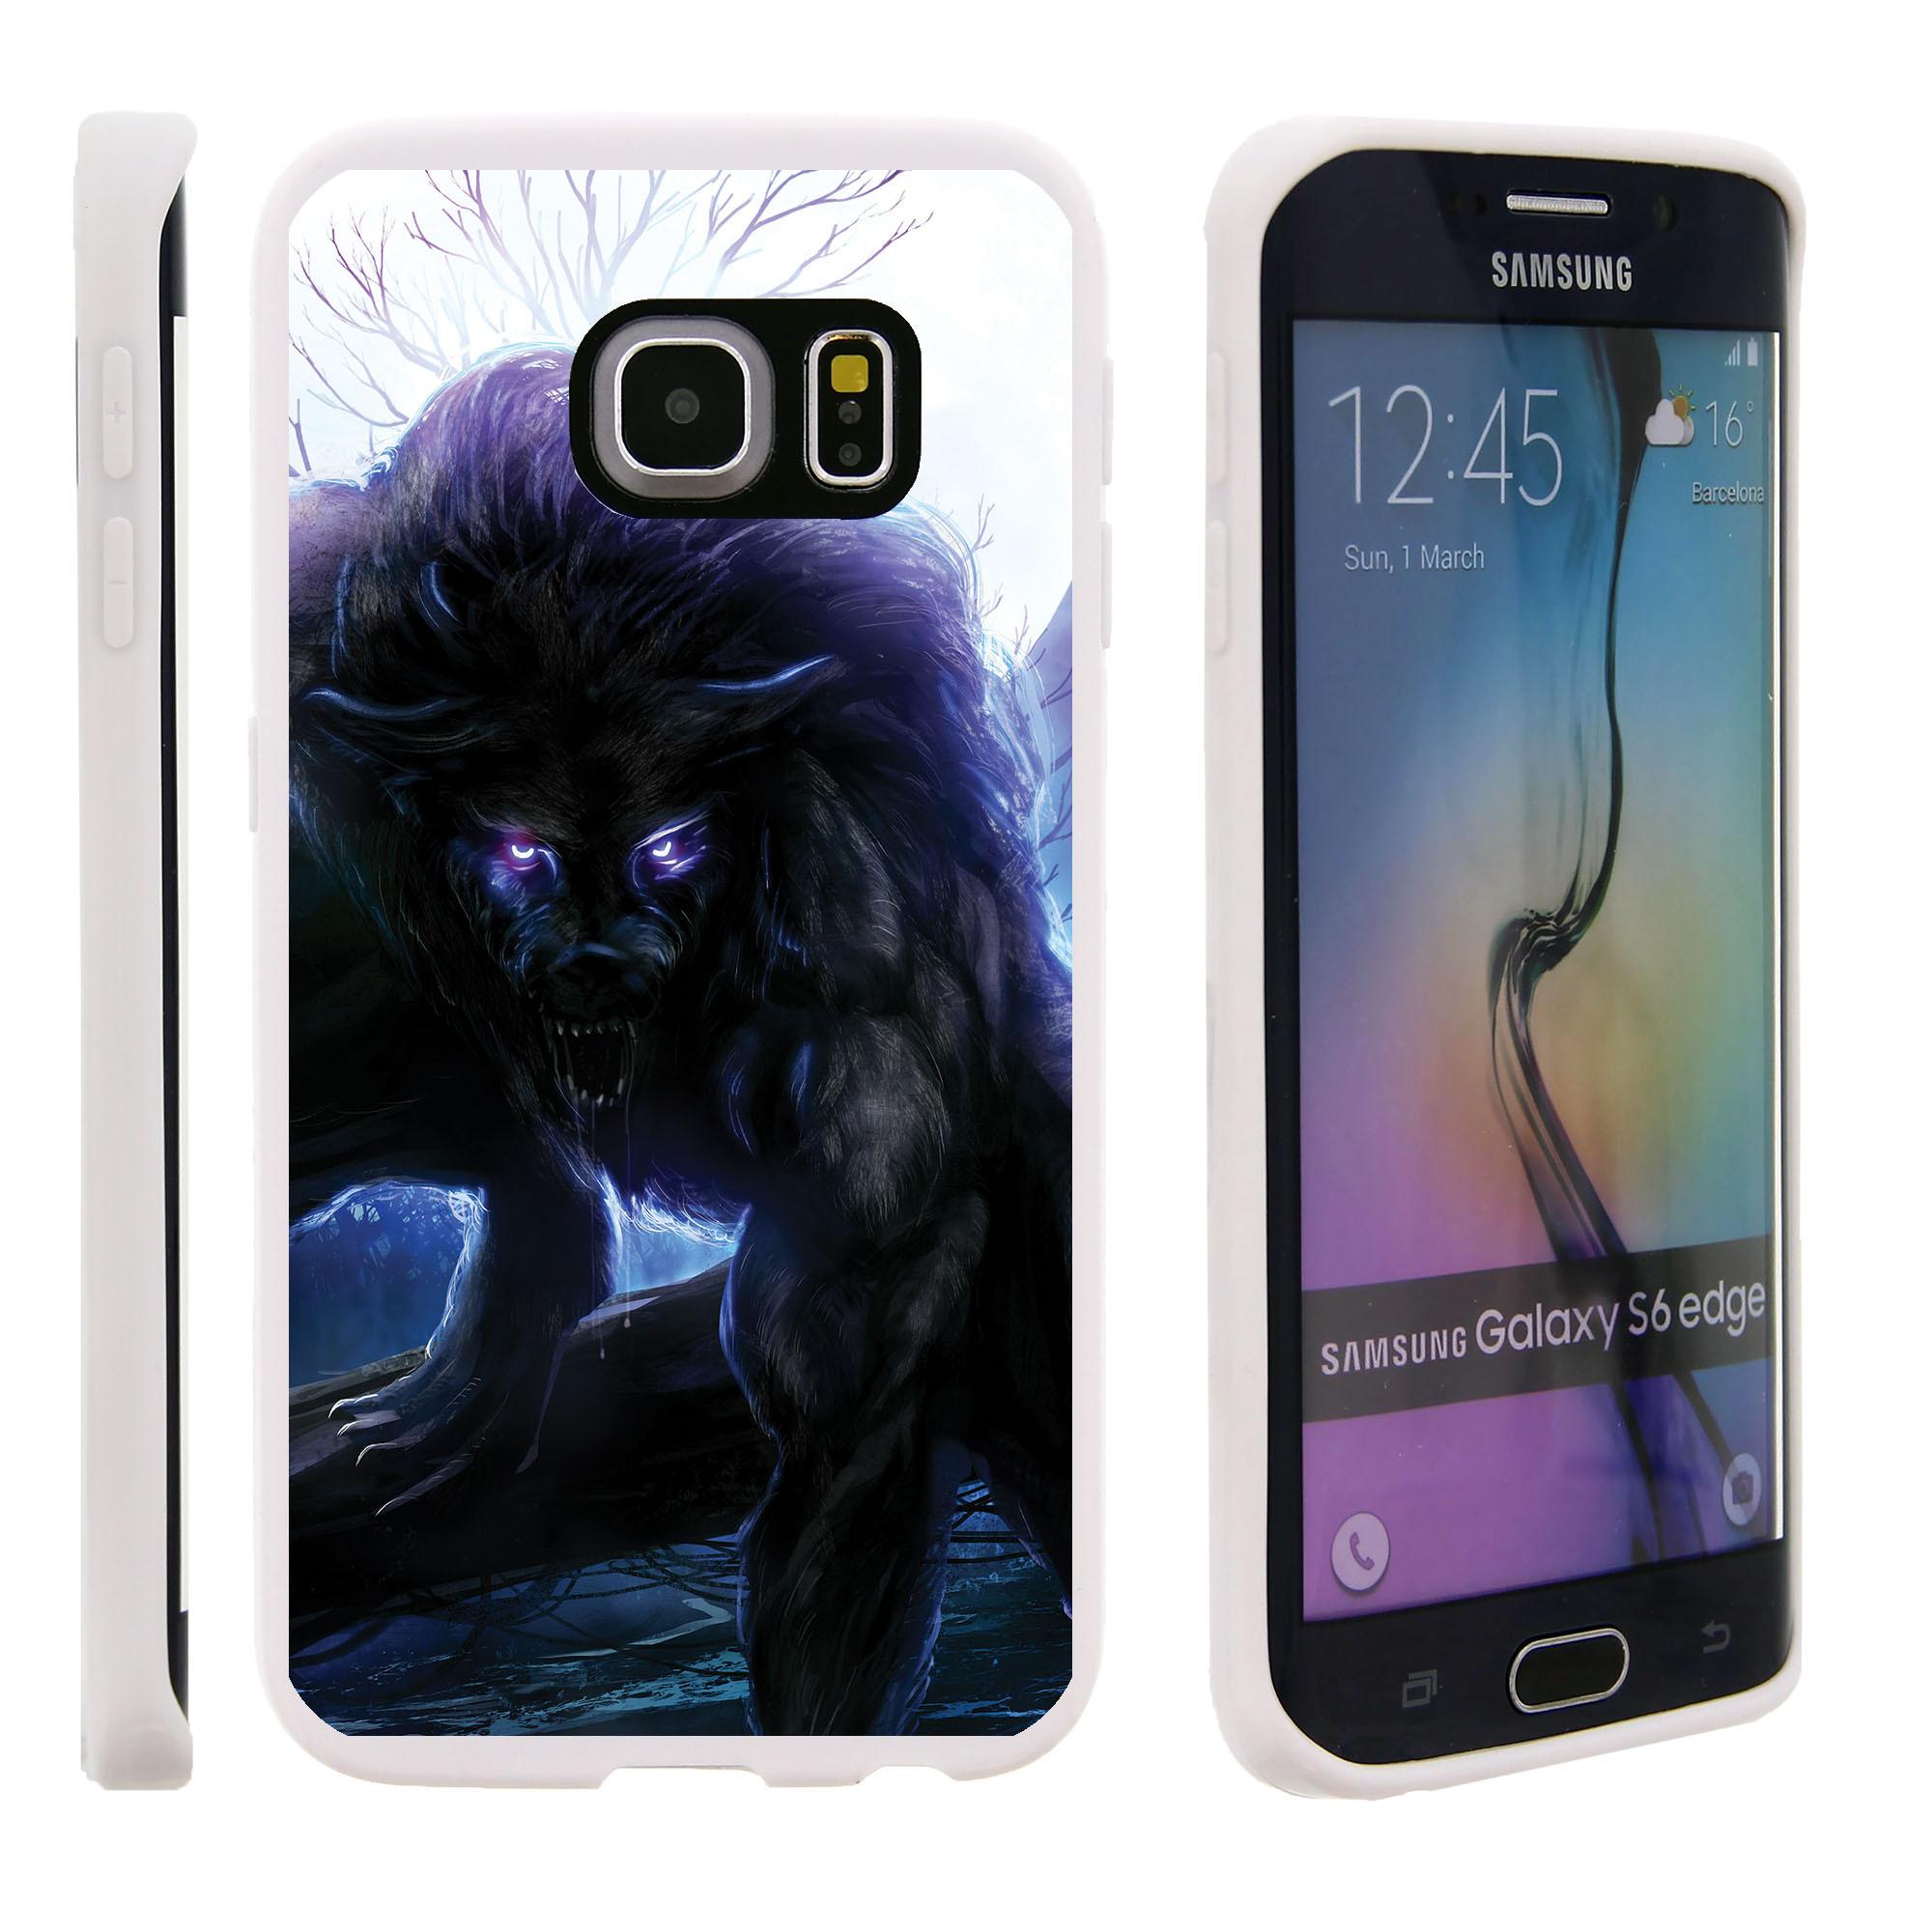 Samsung Galaxy S6 Edge G925, Flexible Case [FLEX FORCE] Slim Durable TPU Sleek Bumper with Unique Designs - Black and Purple Wolf